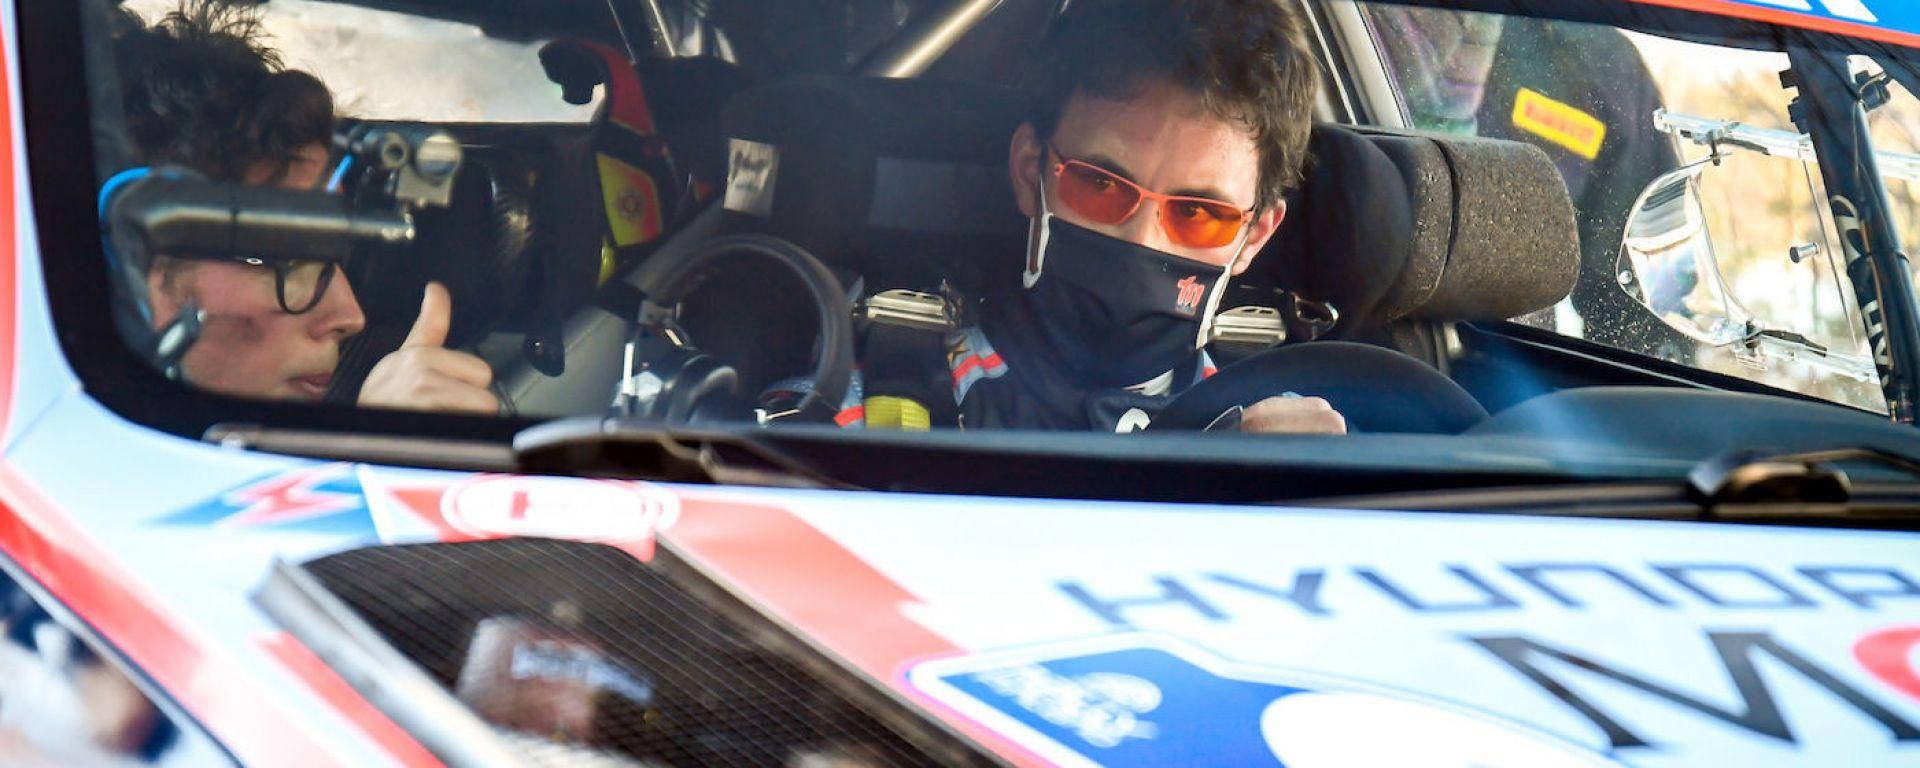 CIR 2021, Rally Il Ciocco: Thierry Neuville (Hyundai)